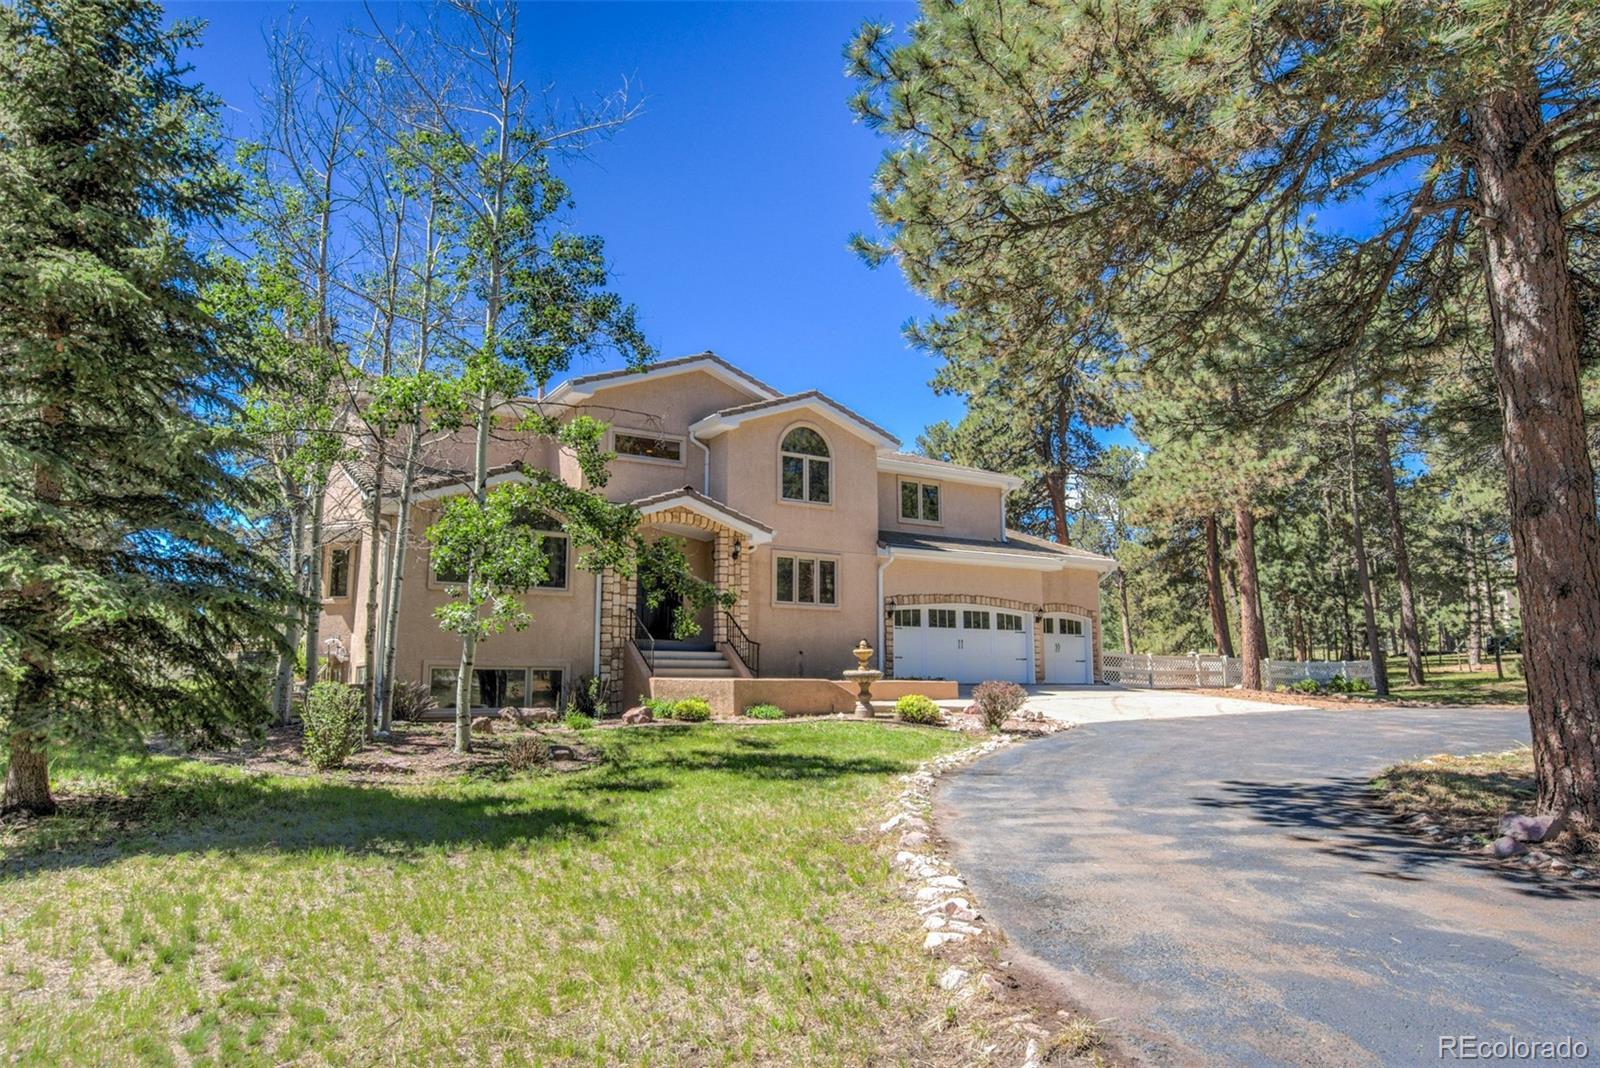 MLS# 2707350 - 3 - 17310 Charter Pines , Colorado Springs, CO 80132